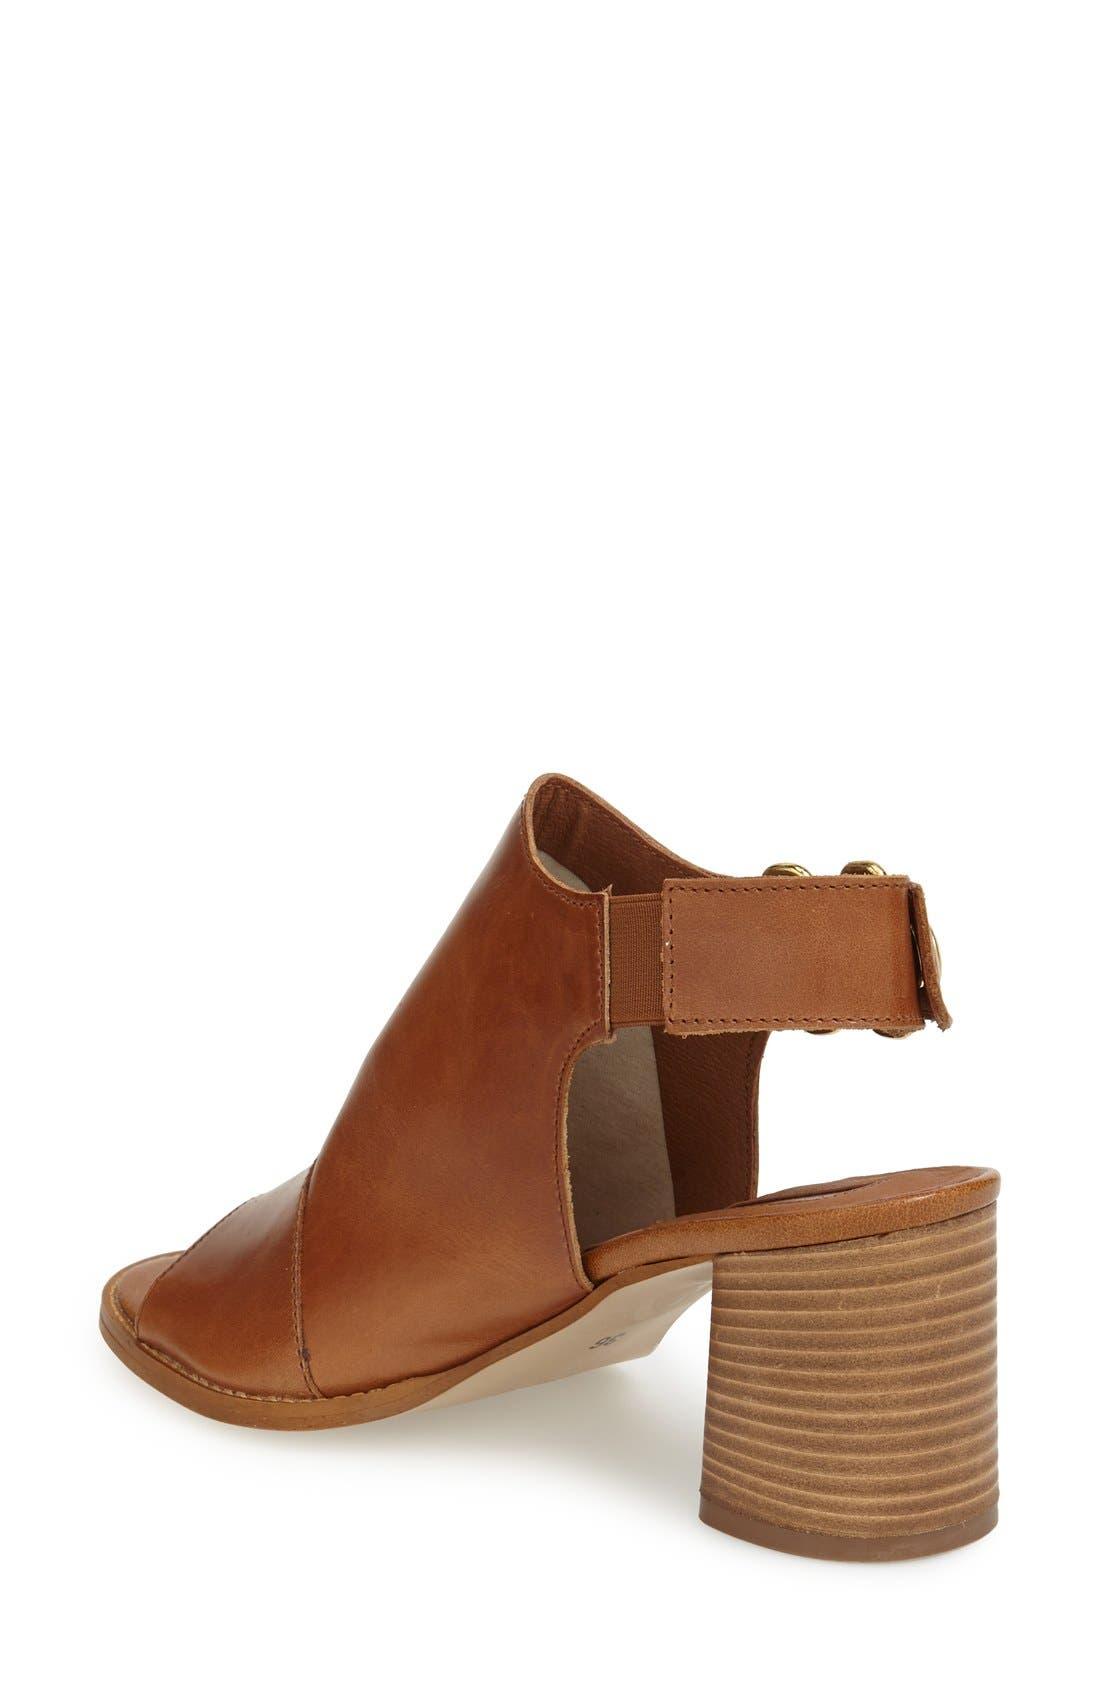 Alternate Image 2  - Topshop 'Nimi' Slingback Round Heel Sandal (Women)